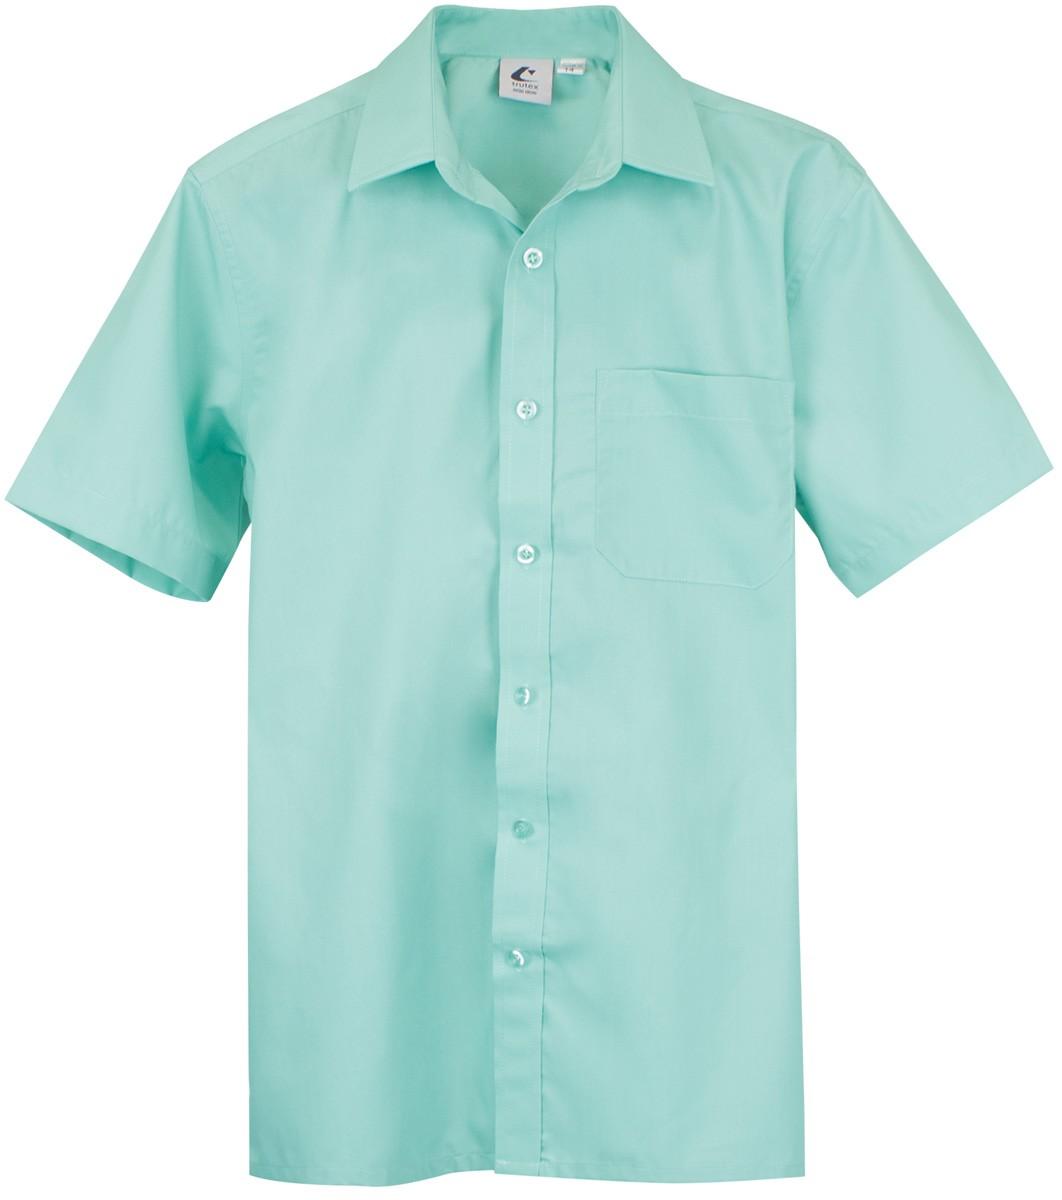 bcd5383ed61 Boys Shirt Short Sleeve Green - The School Locker